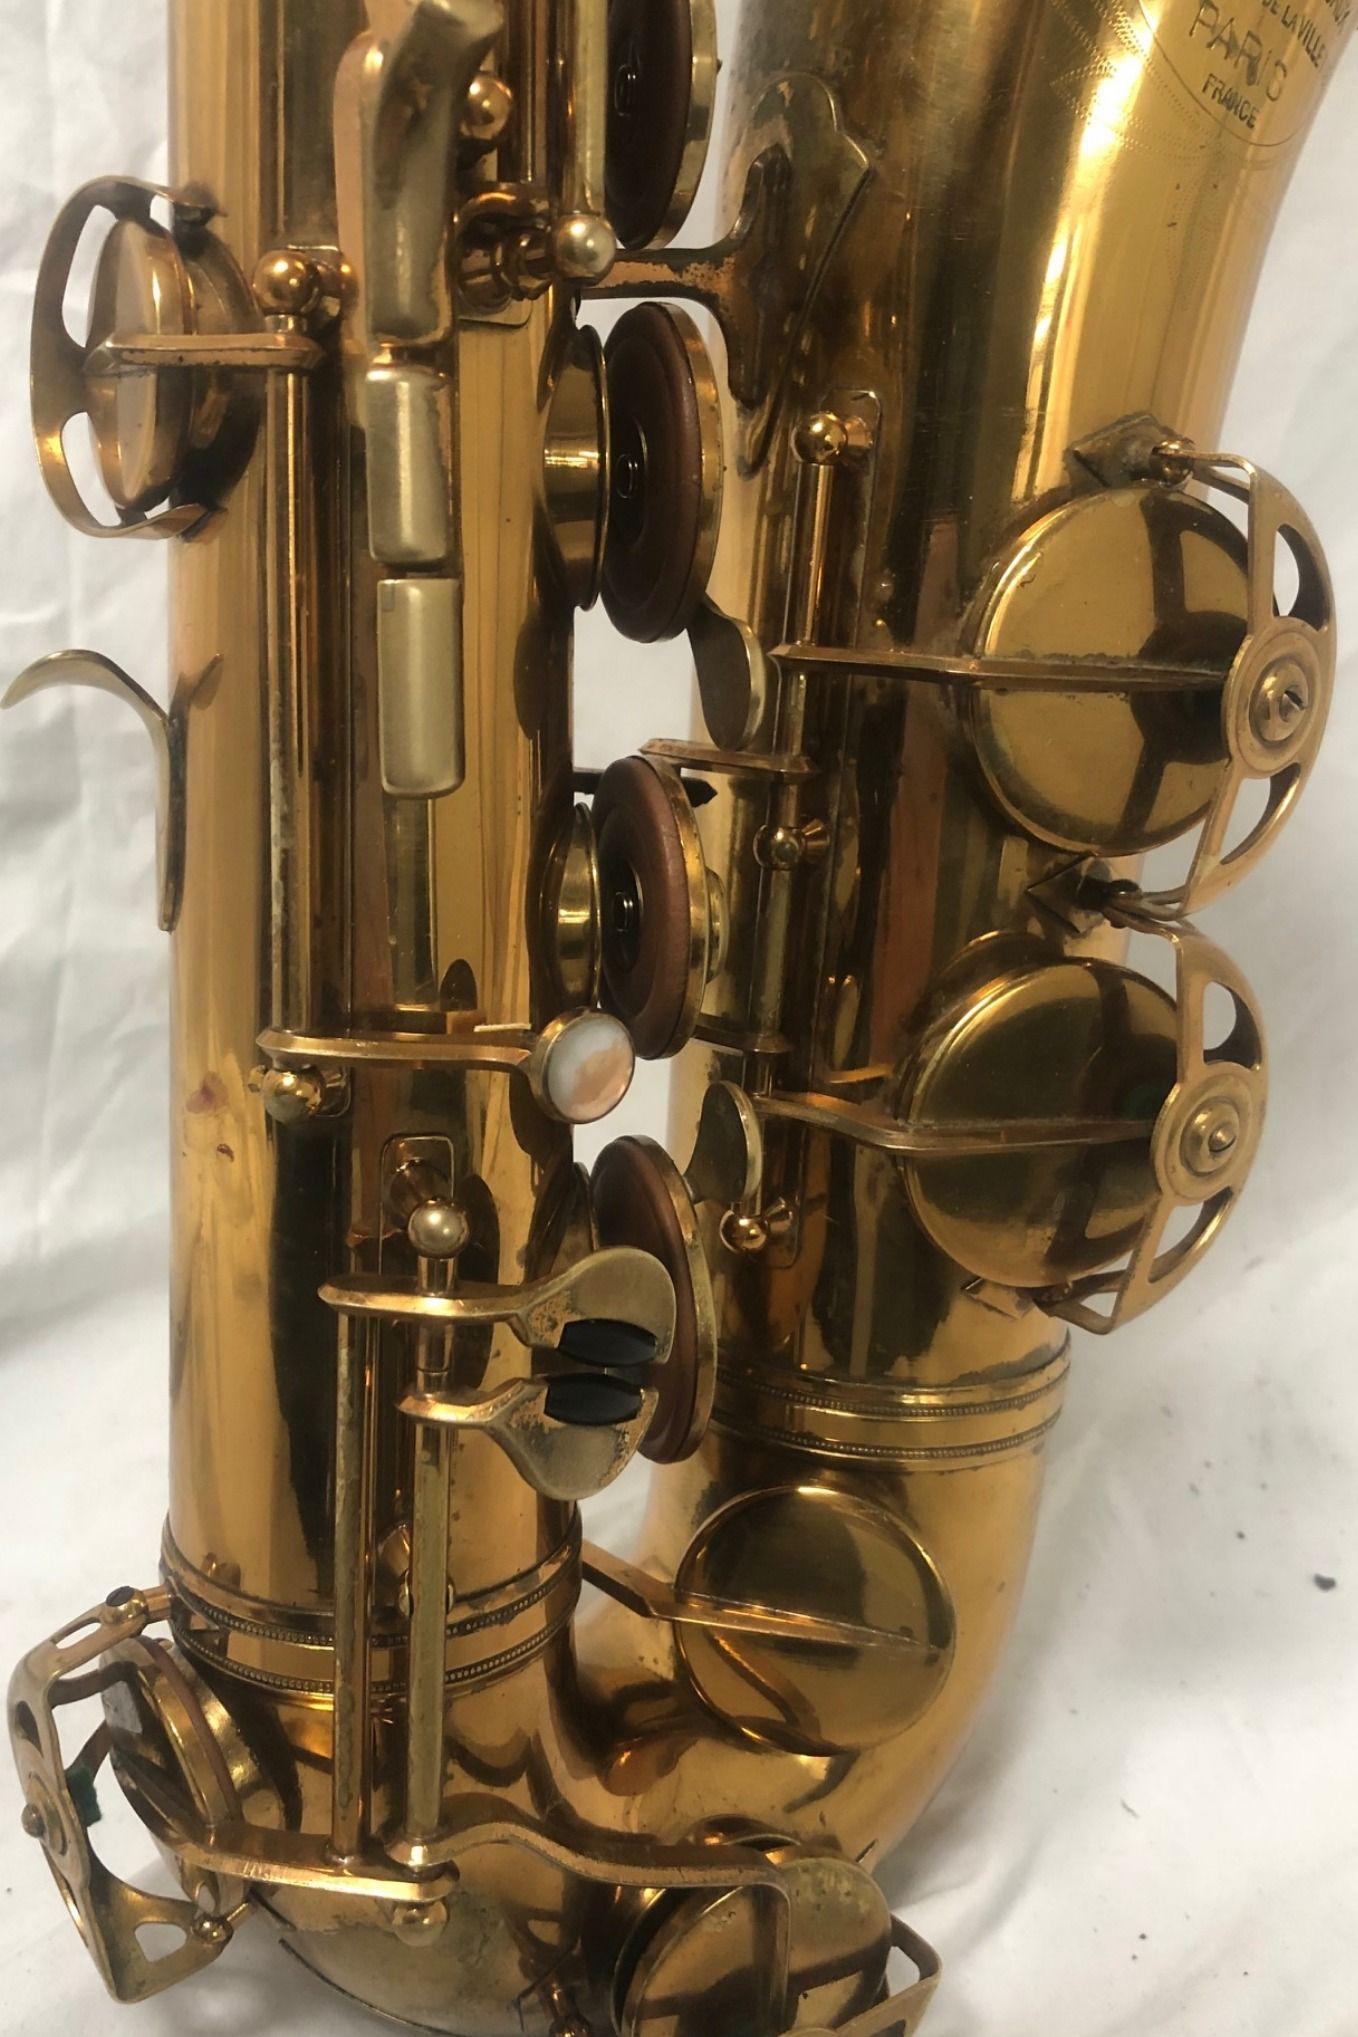 SML tenoe saxophone with rolled tone hole, Italian-made pads